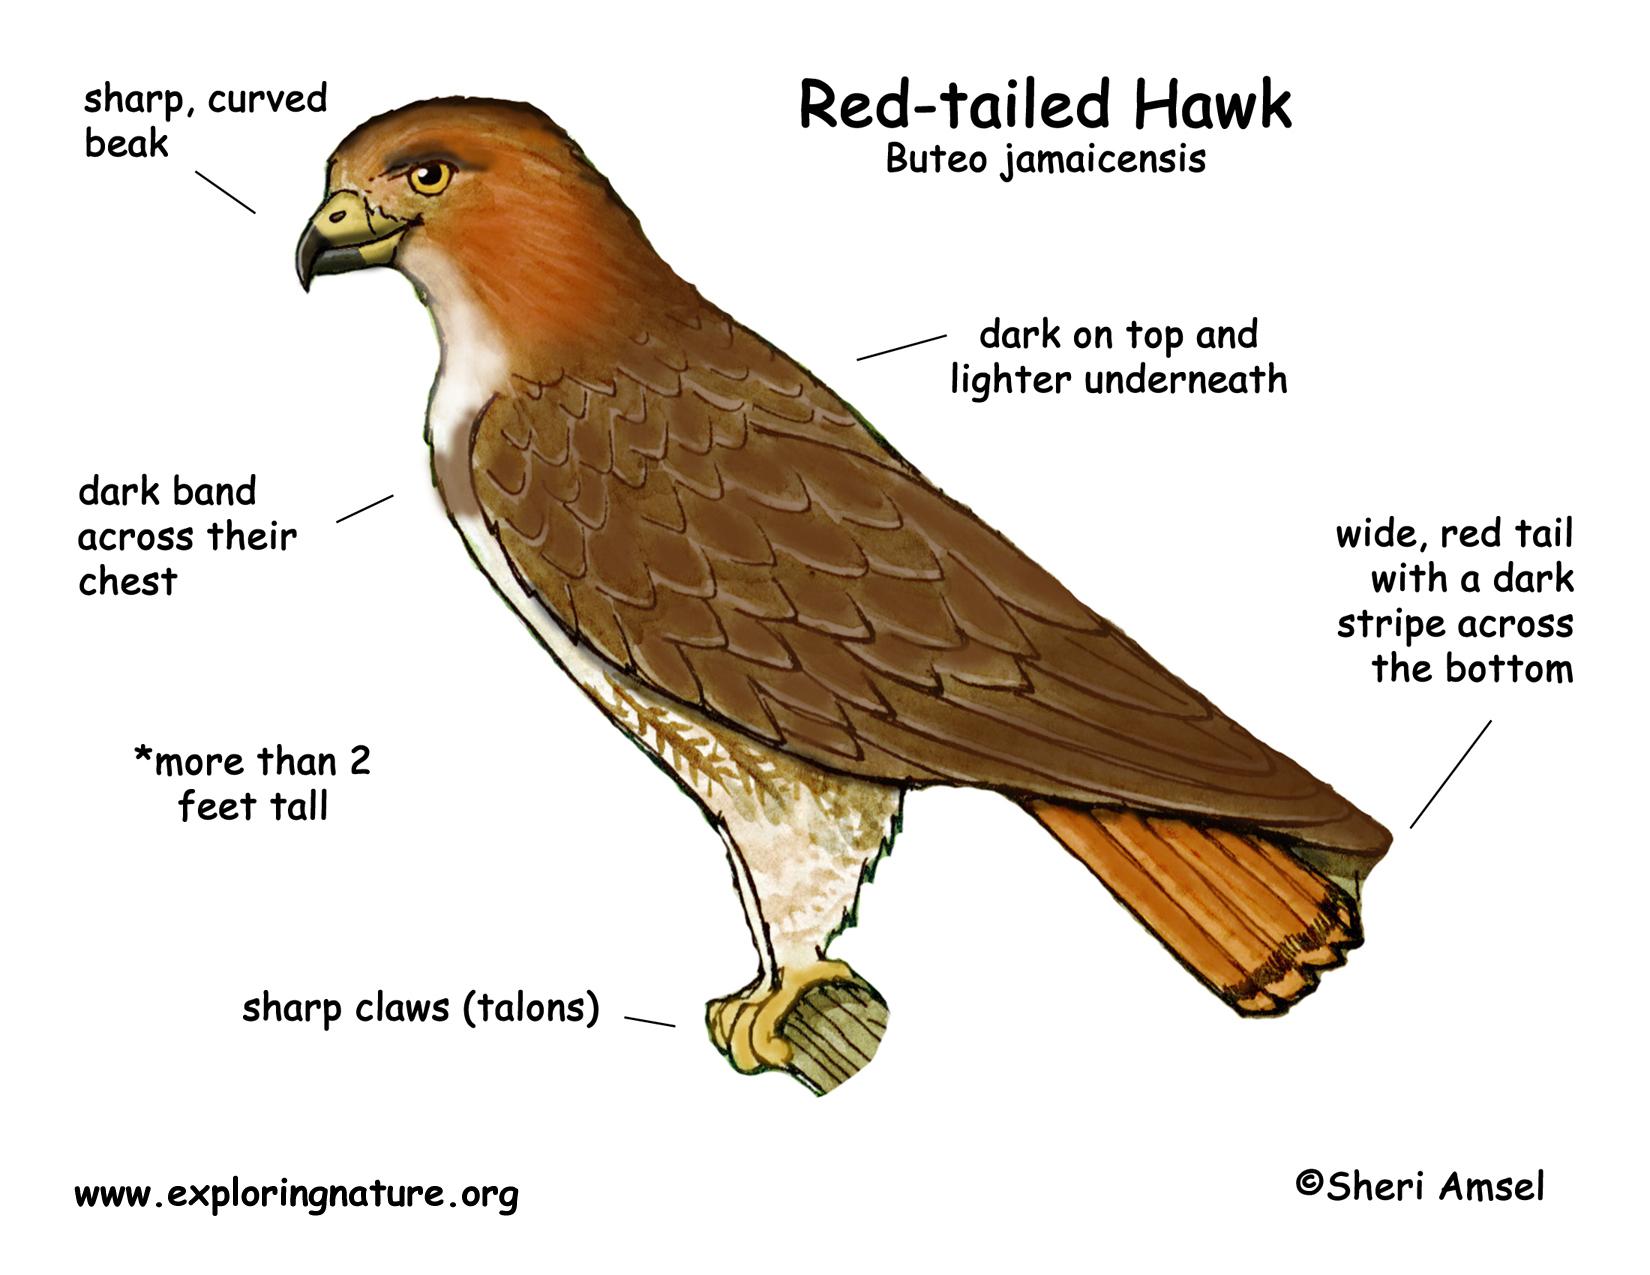 golden eagle skeleton diagram ford ka door wiring exploring nature educational resource error